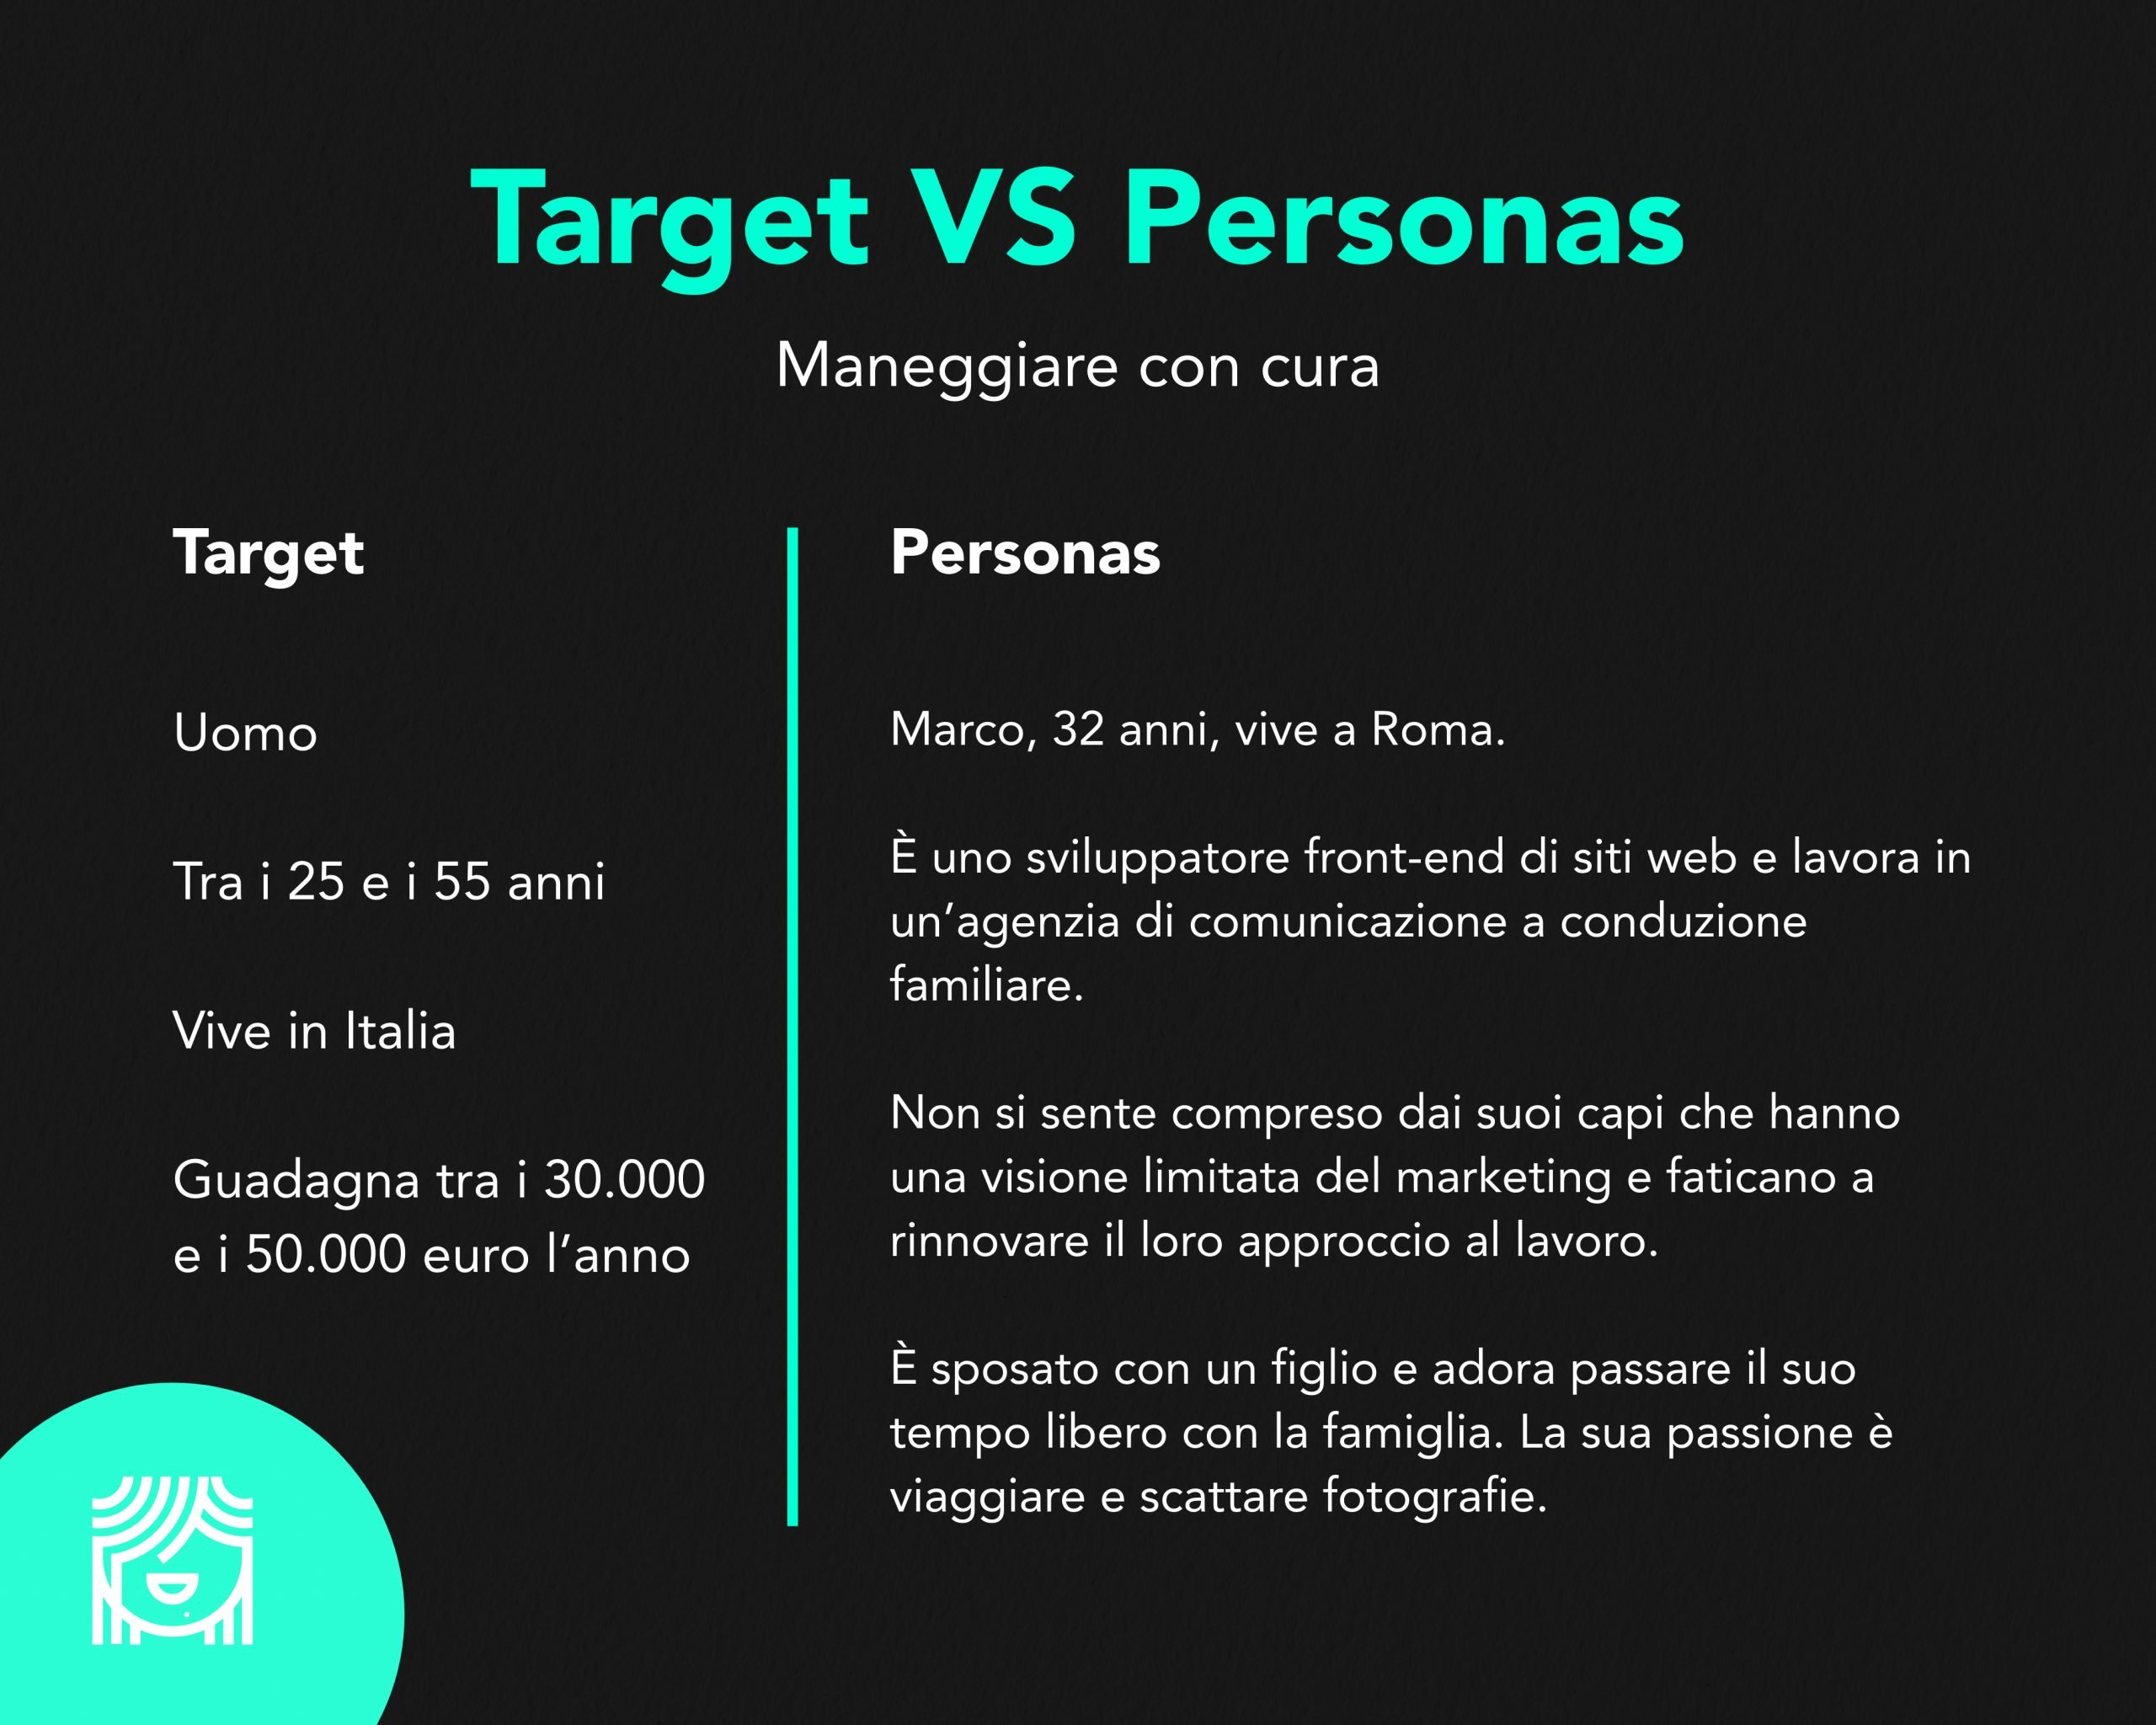 Target vs Personas